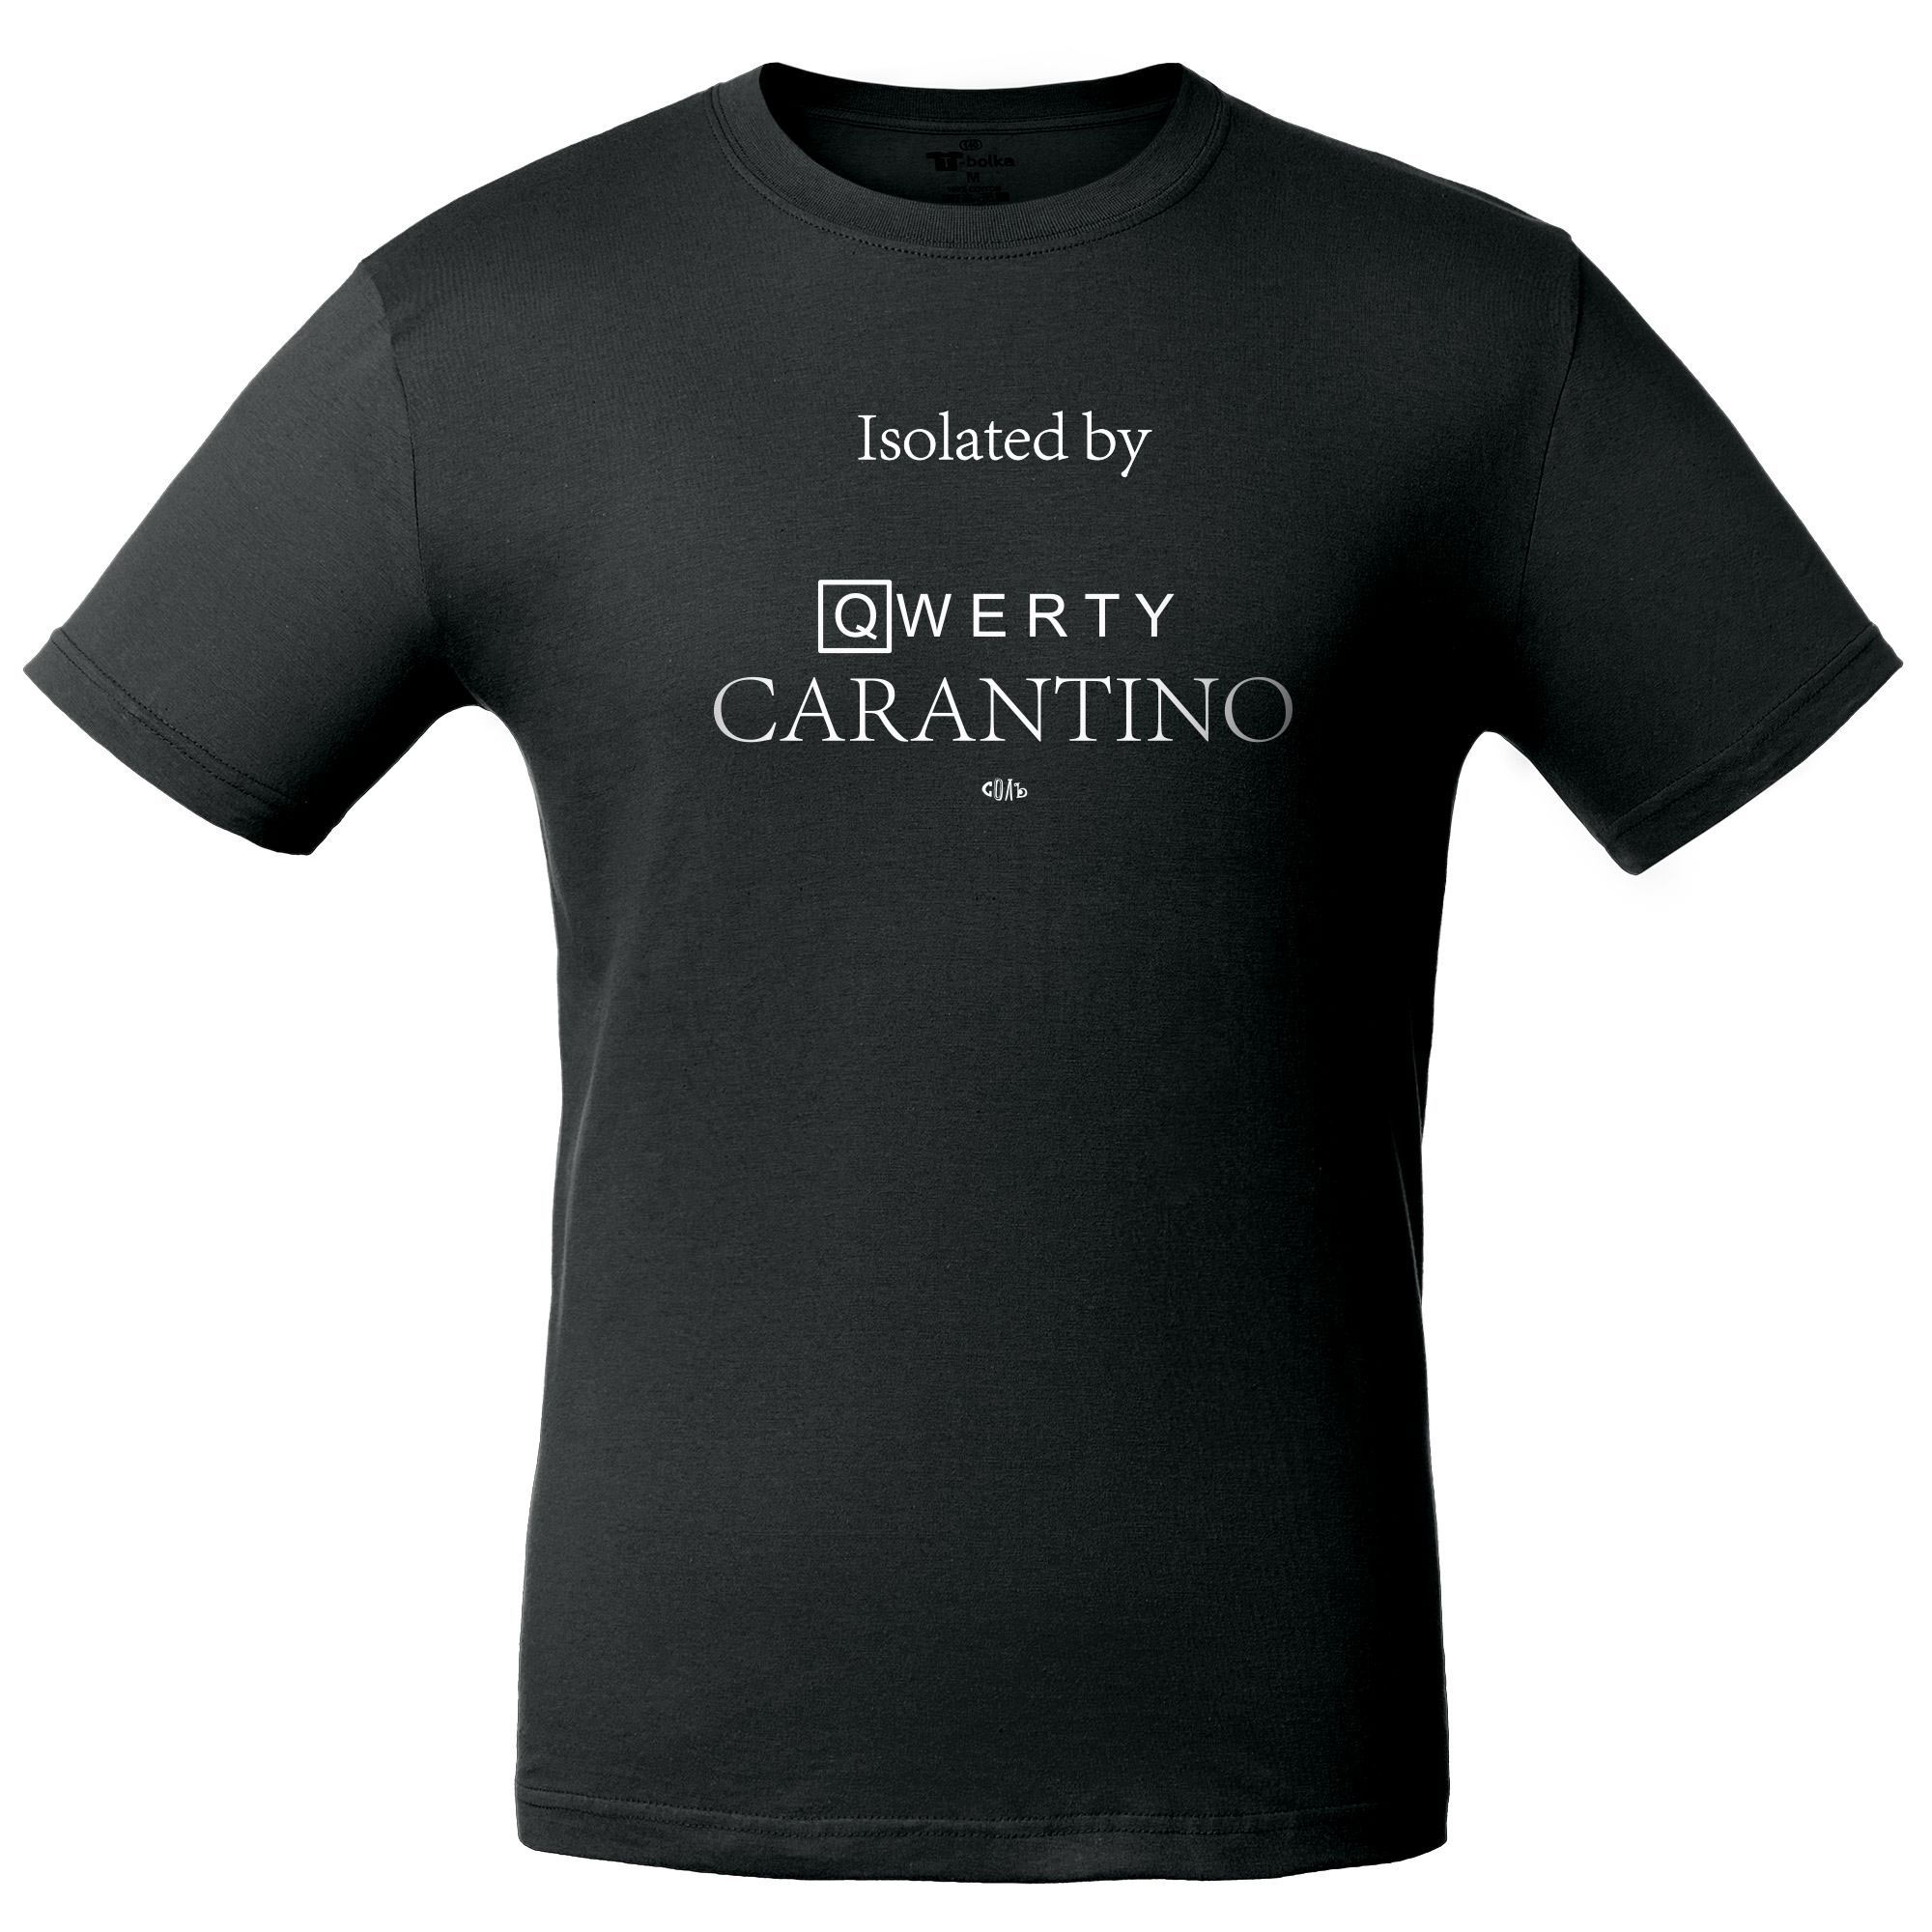 Футболка Carantino, черная